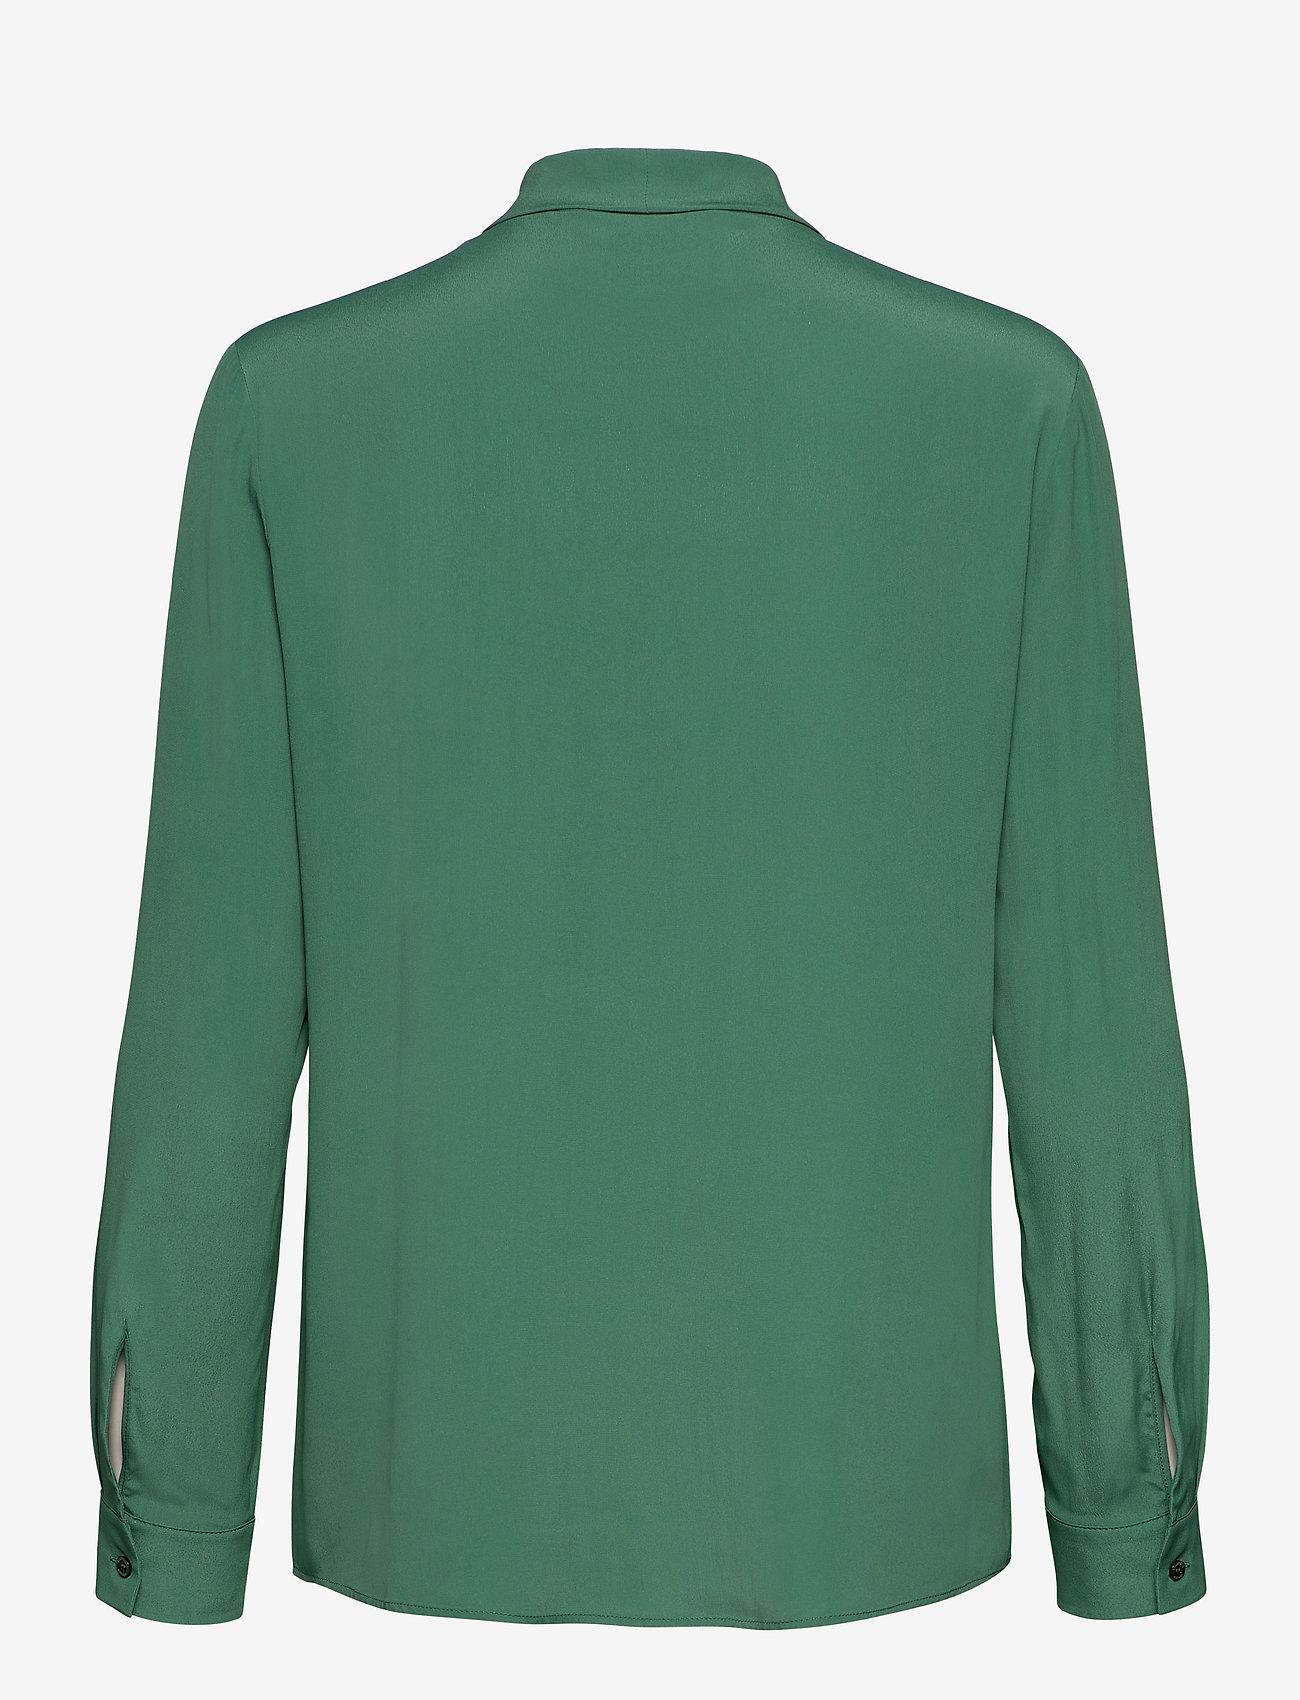 Boutique Moschino - Boutique Moschino BLOUSE - langærmede bluser - green - 1